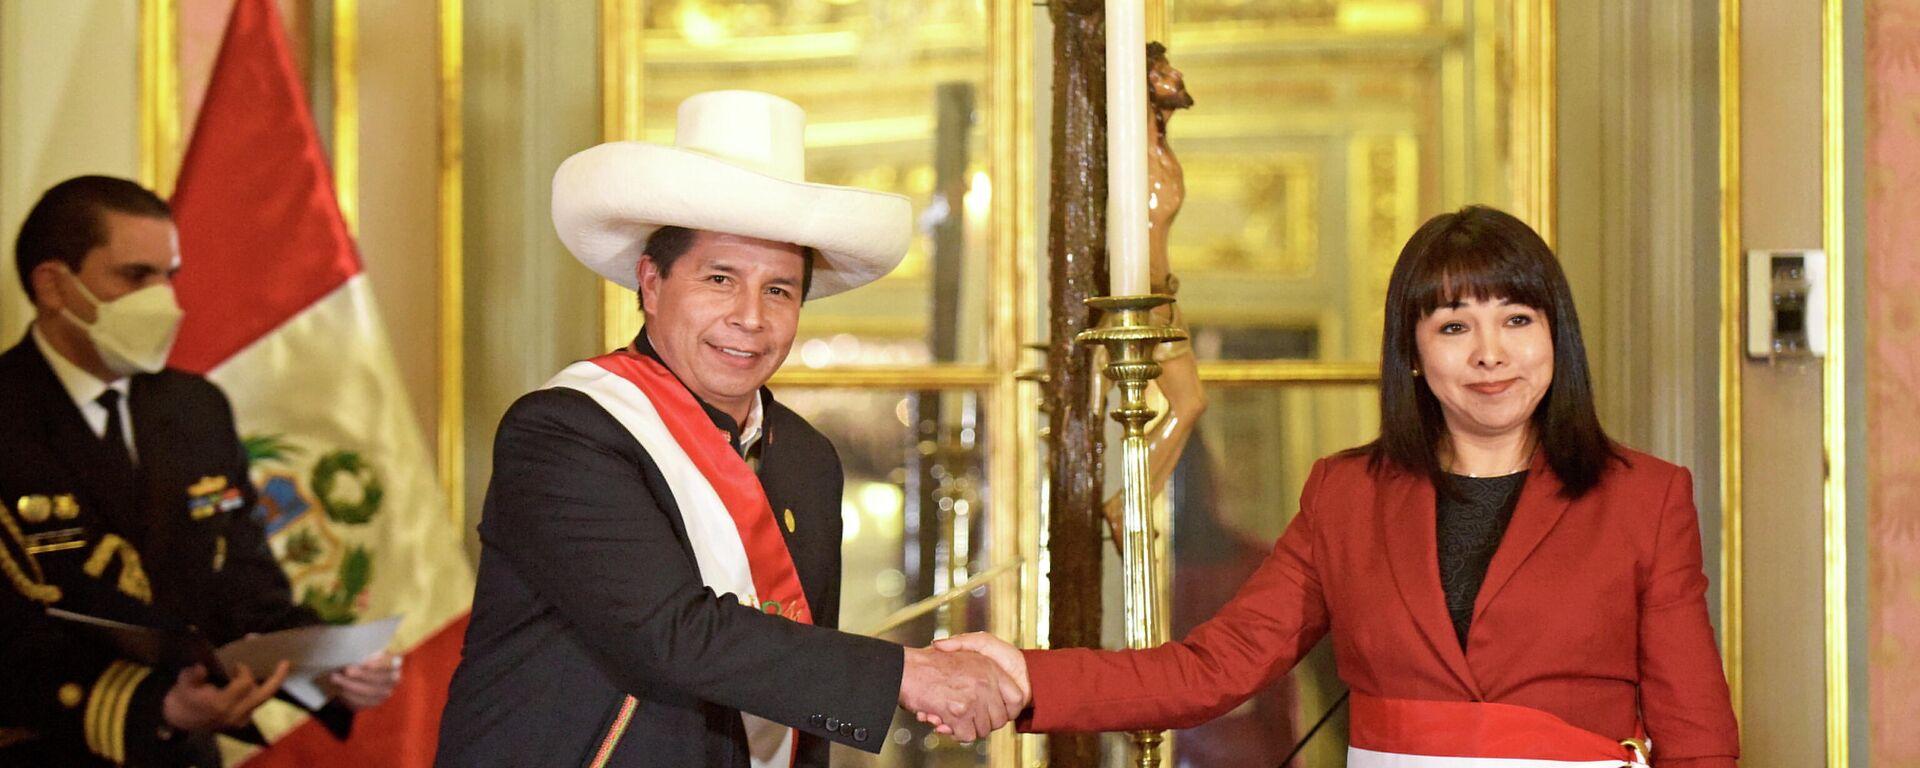 El presidente de Perú, Pedro Castillo, toma juramento a Mirtha Vázquez como primera ministra - Sputnik Mundo, 1920, 07.10.2021